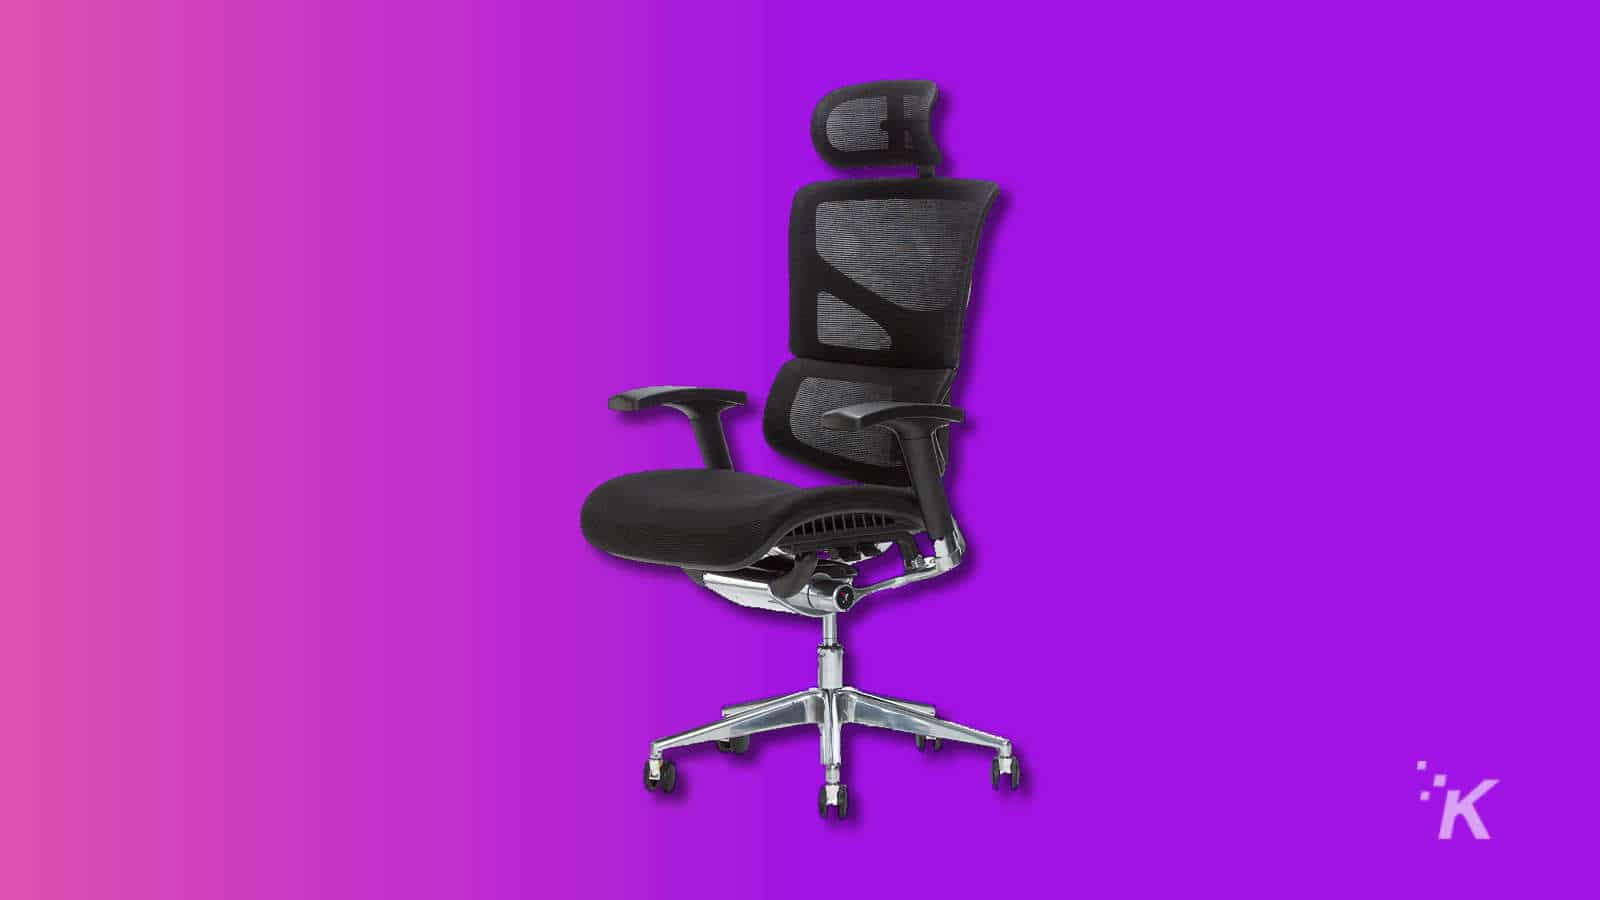 xchair x3 office chair